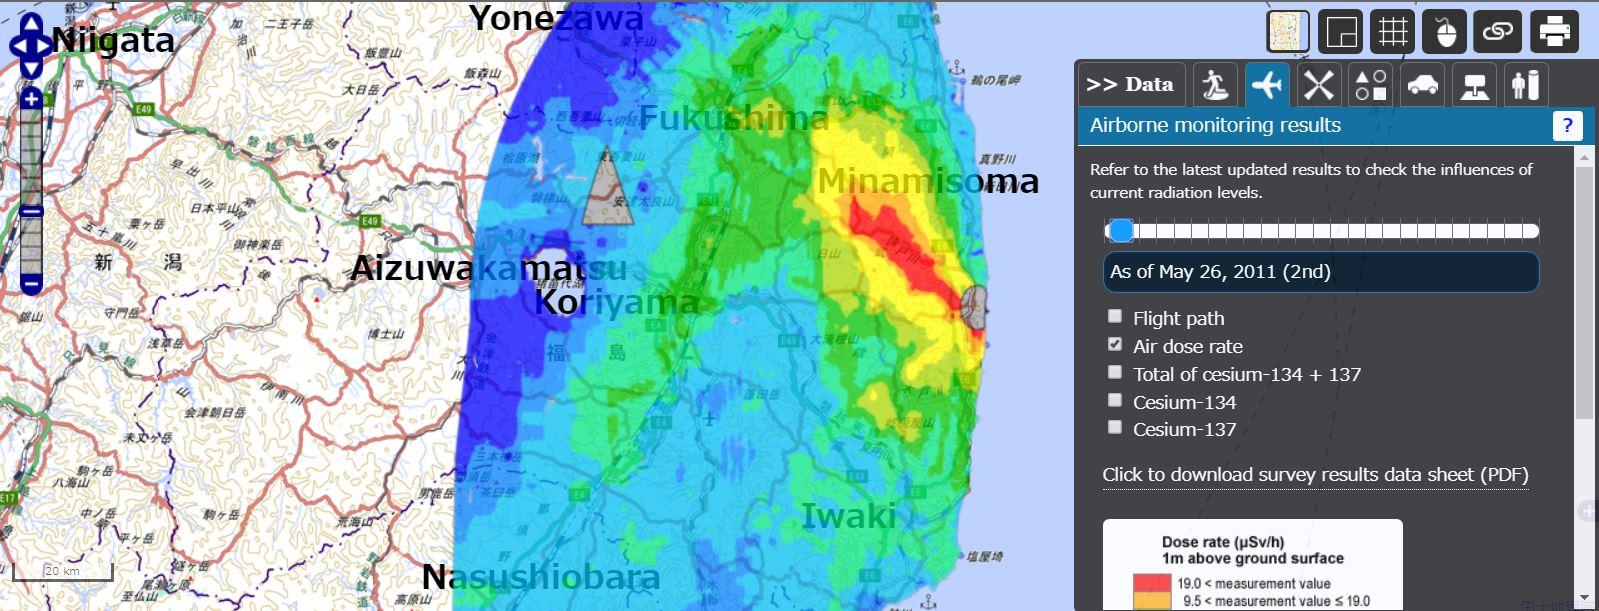 Fukushima Radiation Maps – SimplyInfo.org